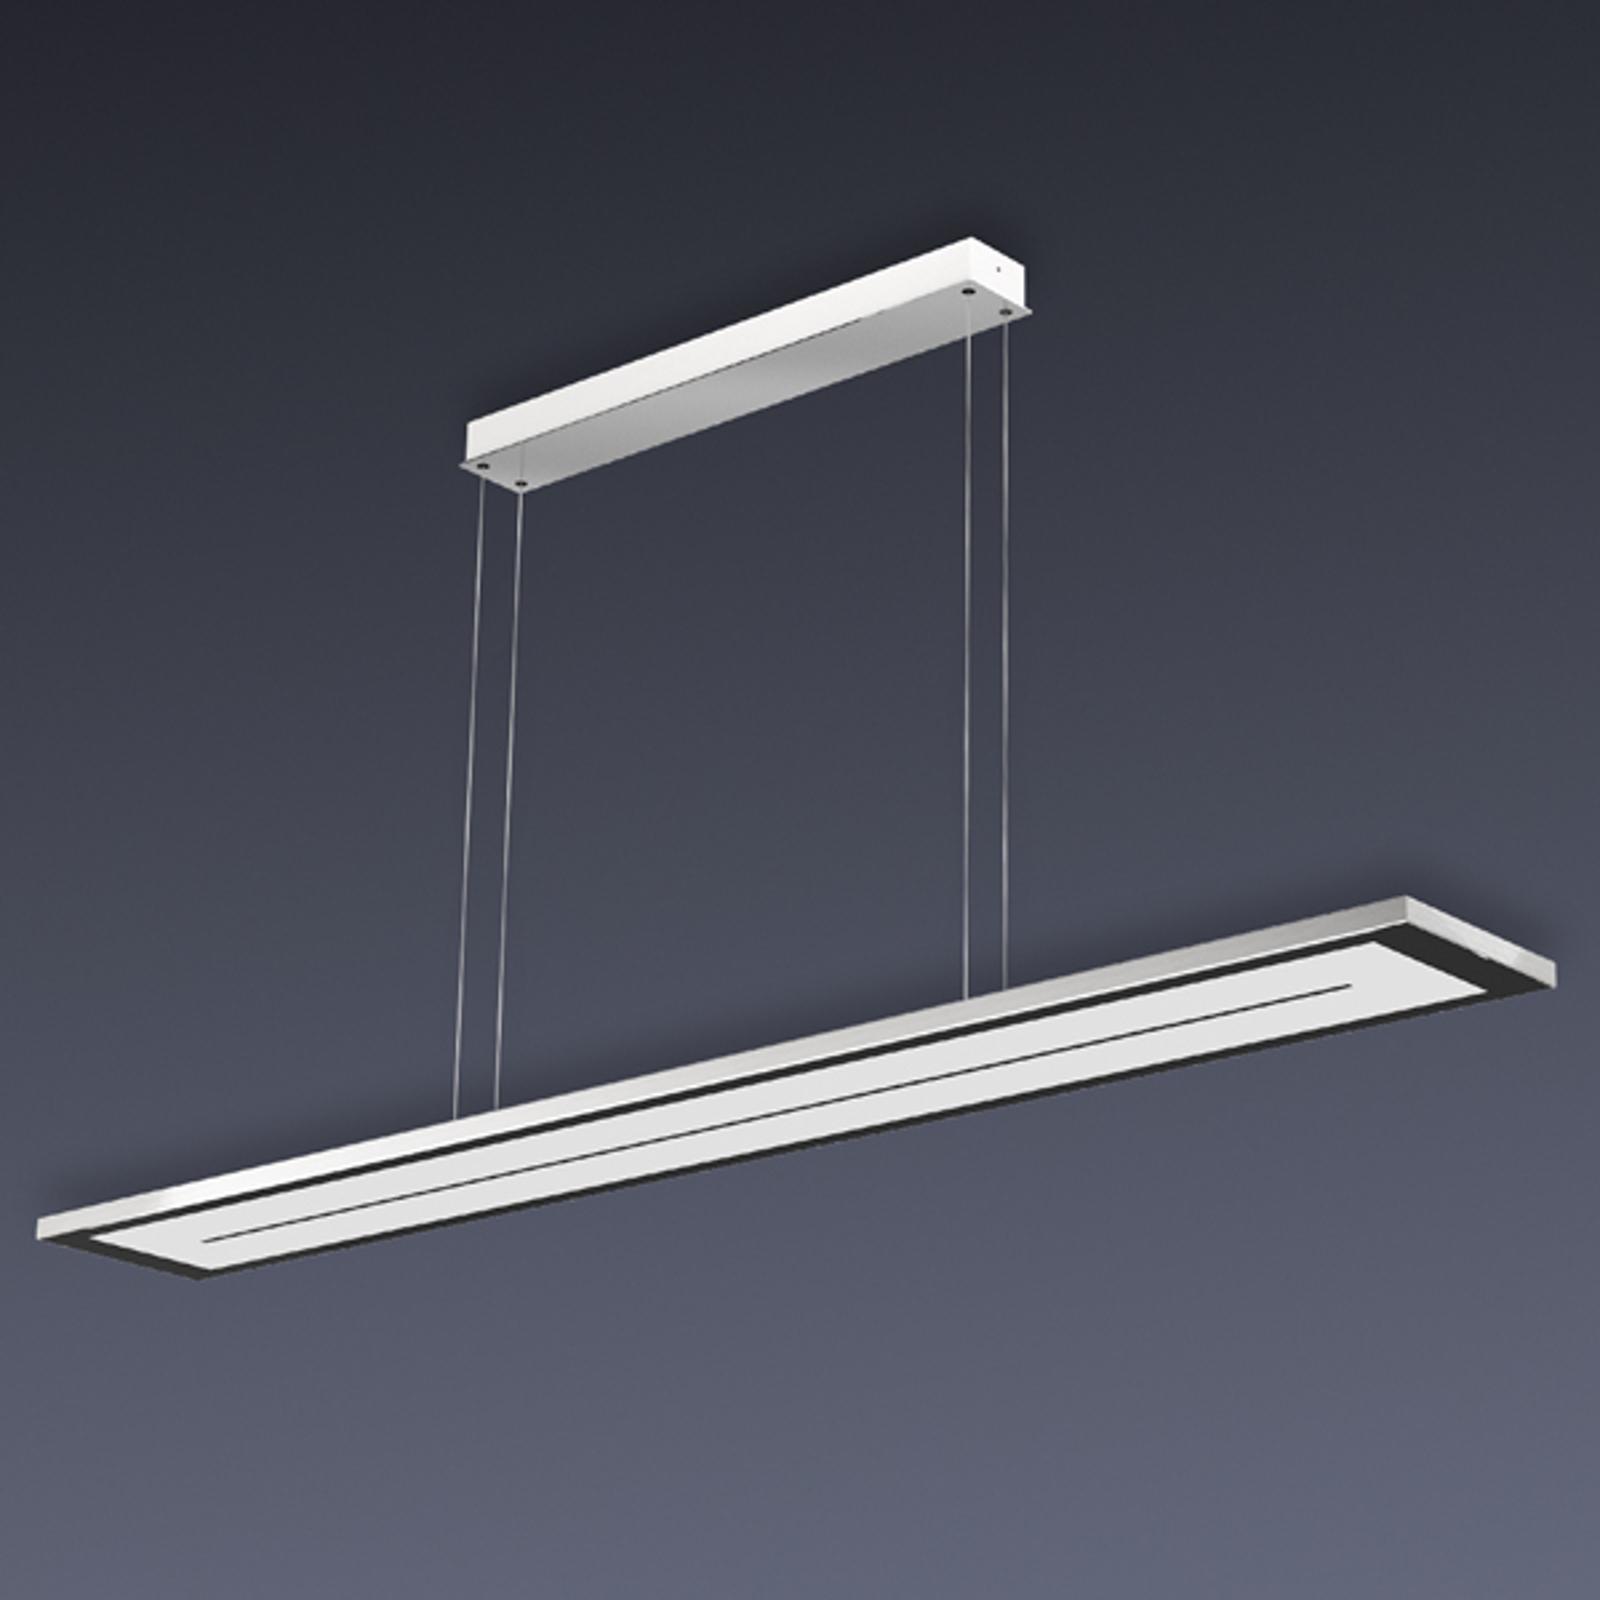 Lampada a sospensione LED Zen dimmerabile 180cm